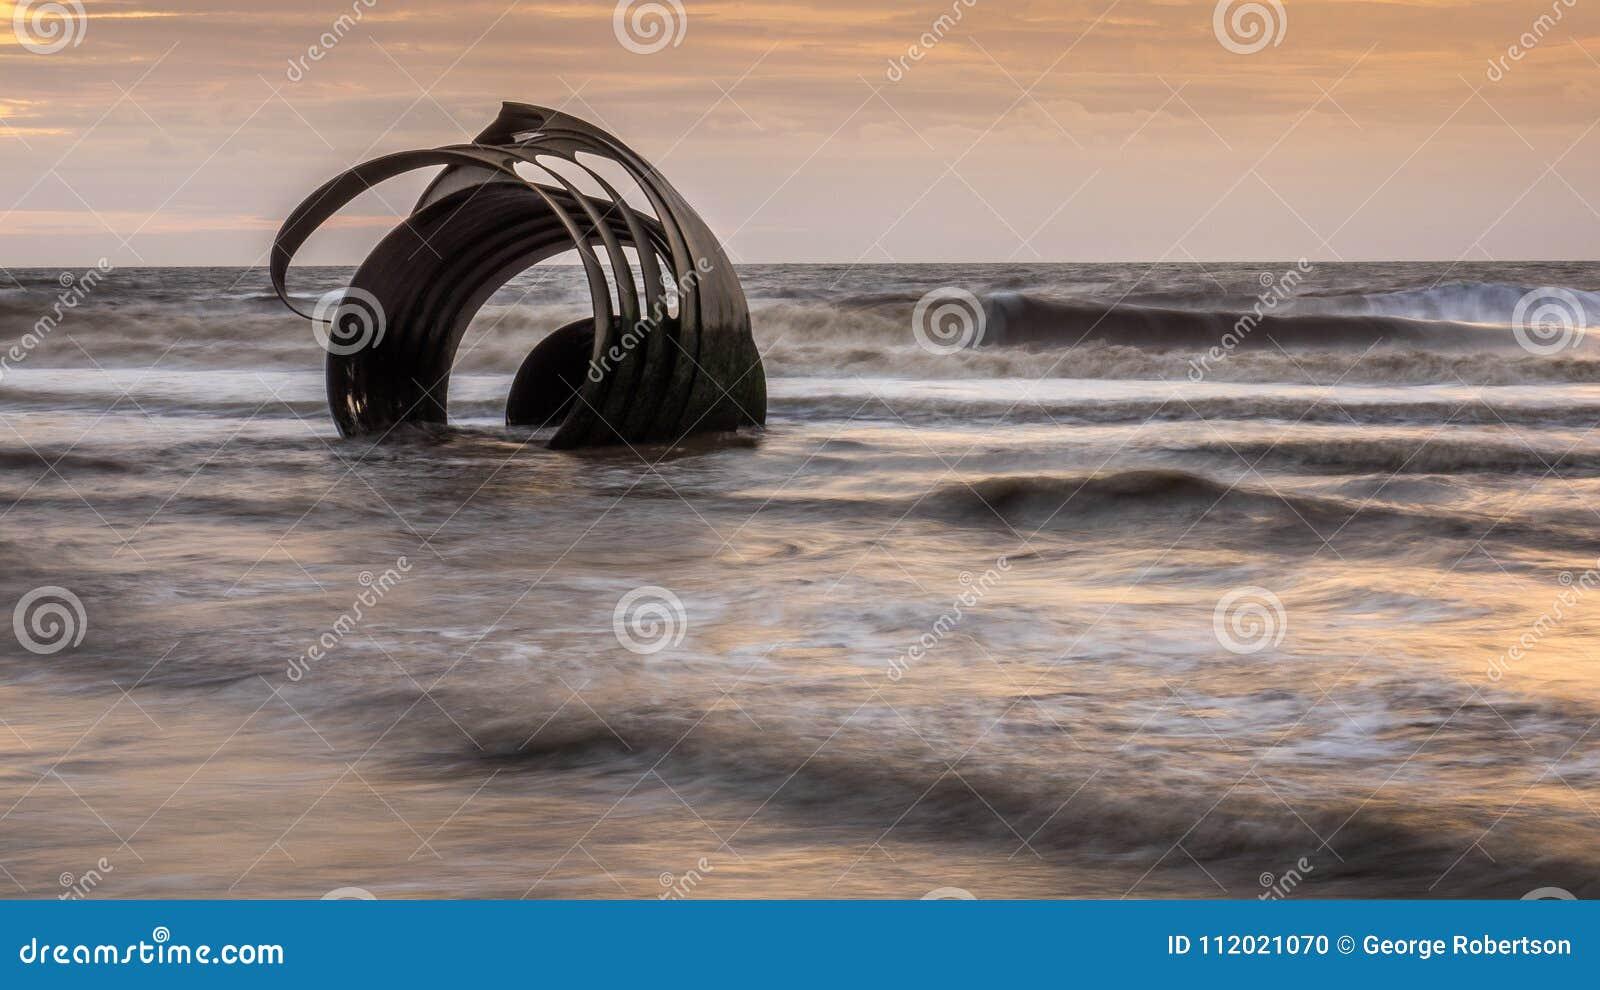 Marys Shell on Cleveleys beach, England